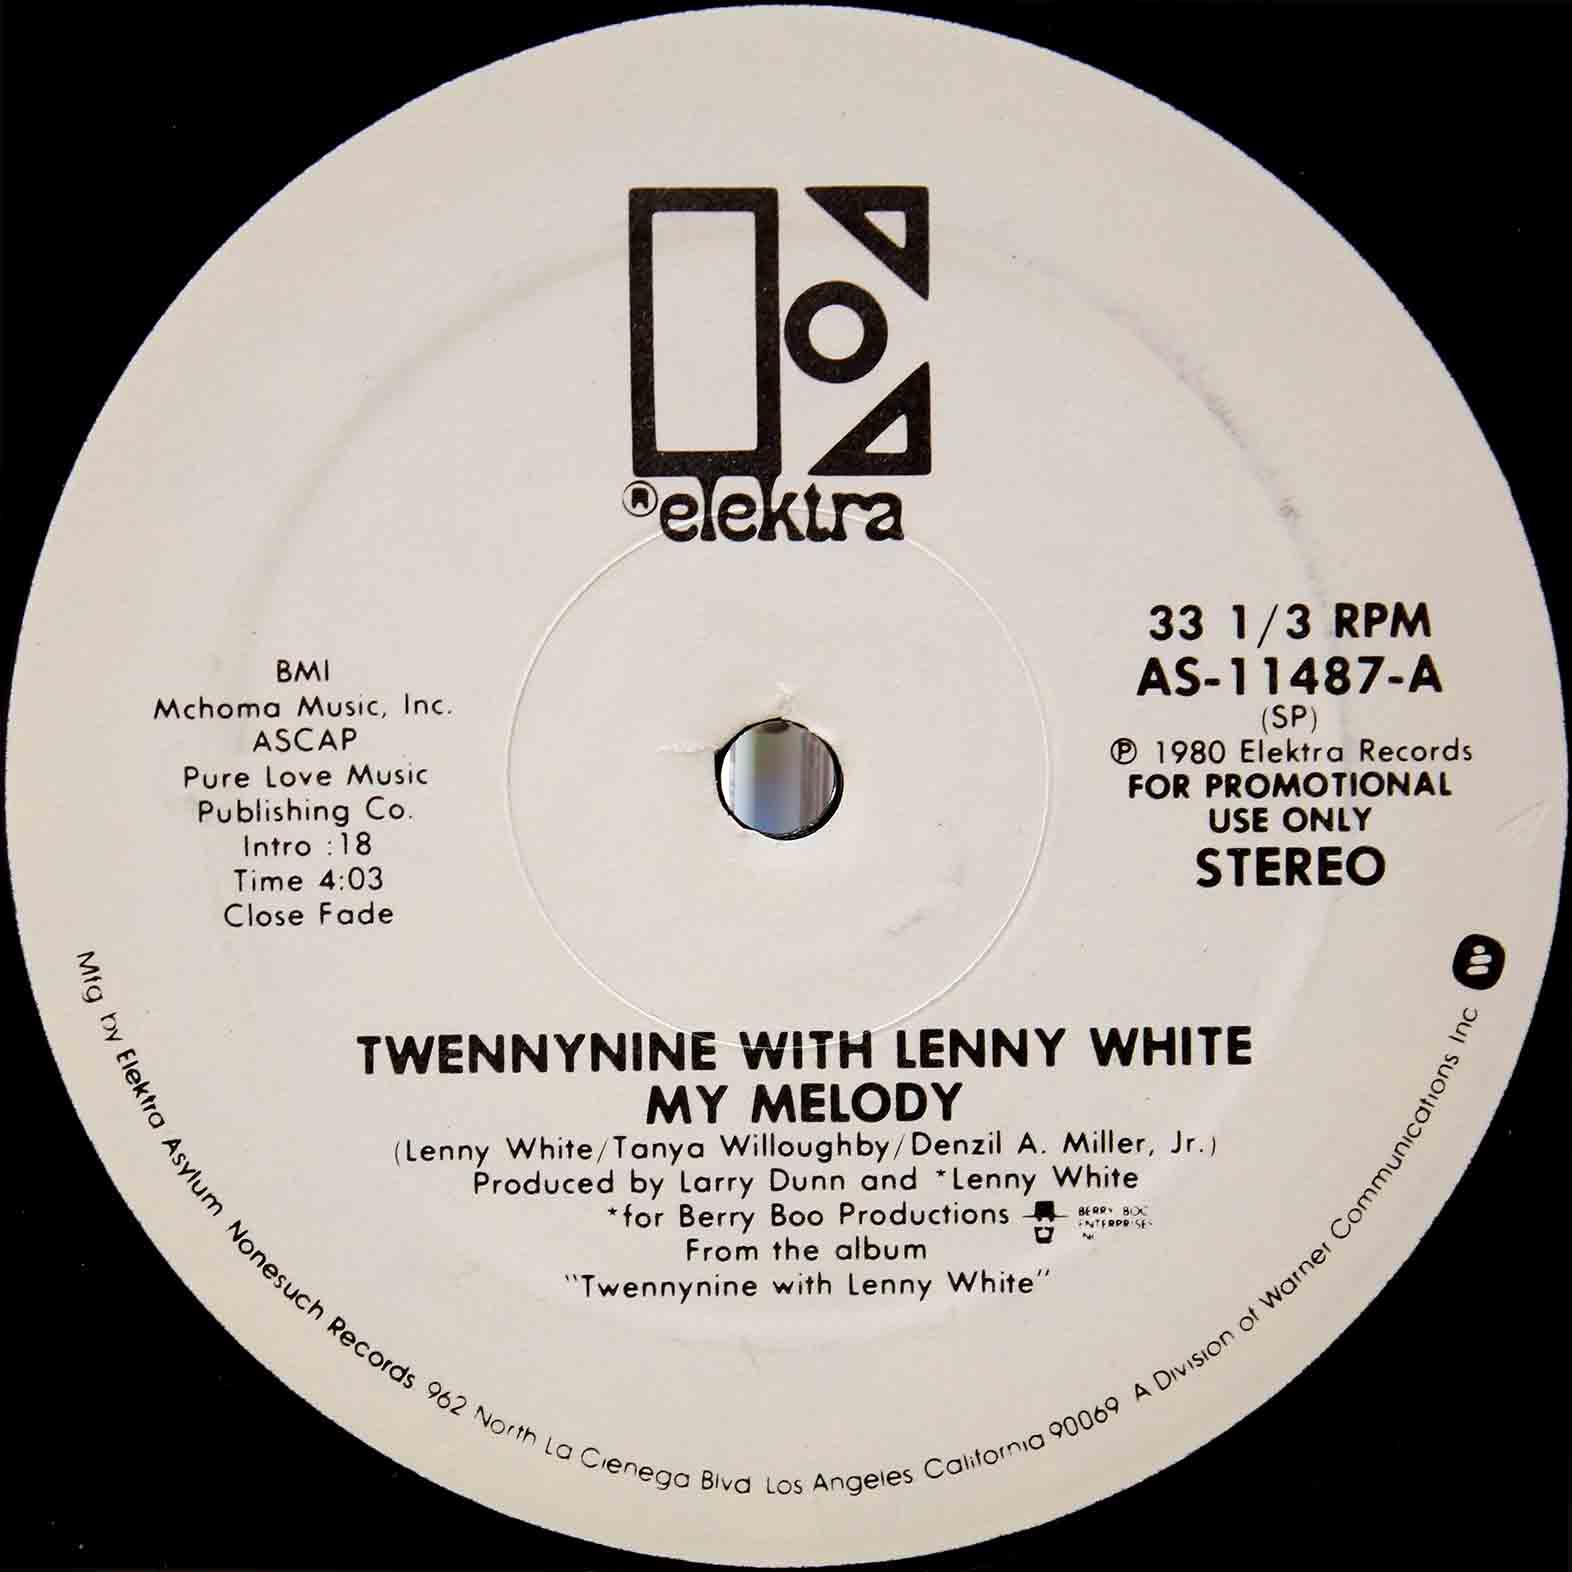 Twennynine With Lenny White – My Melody 03